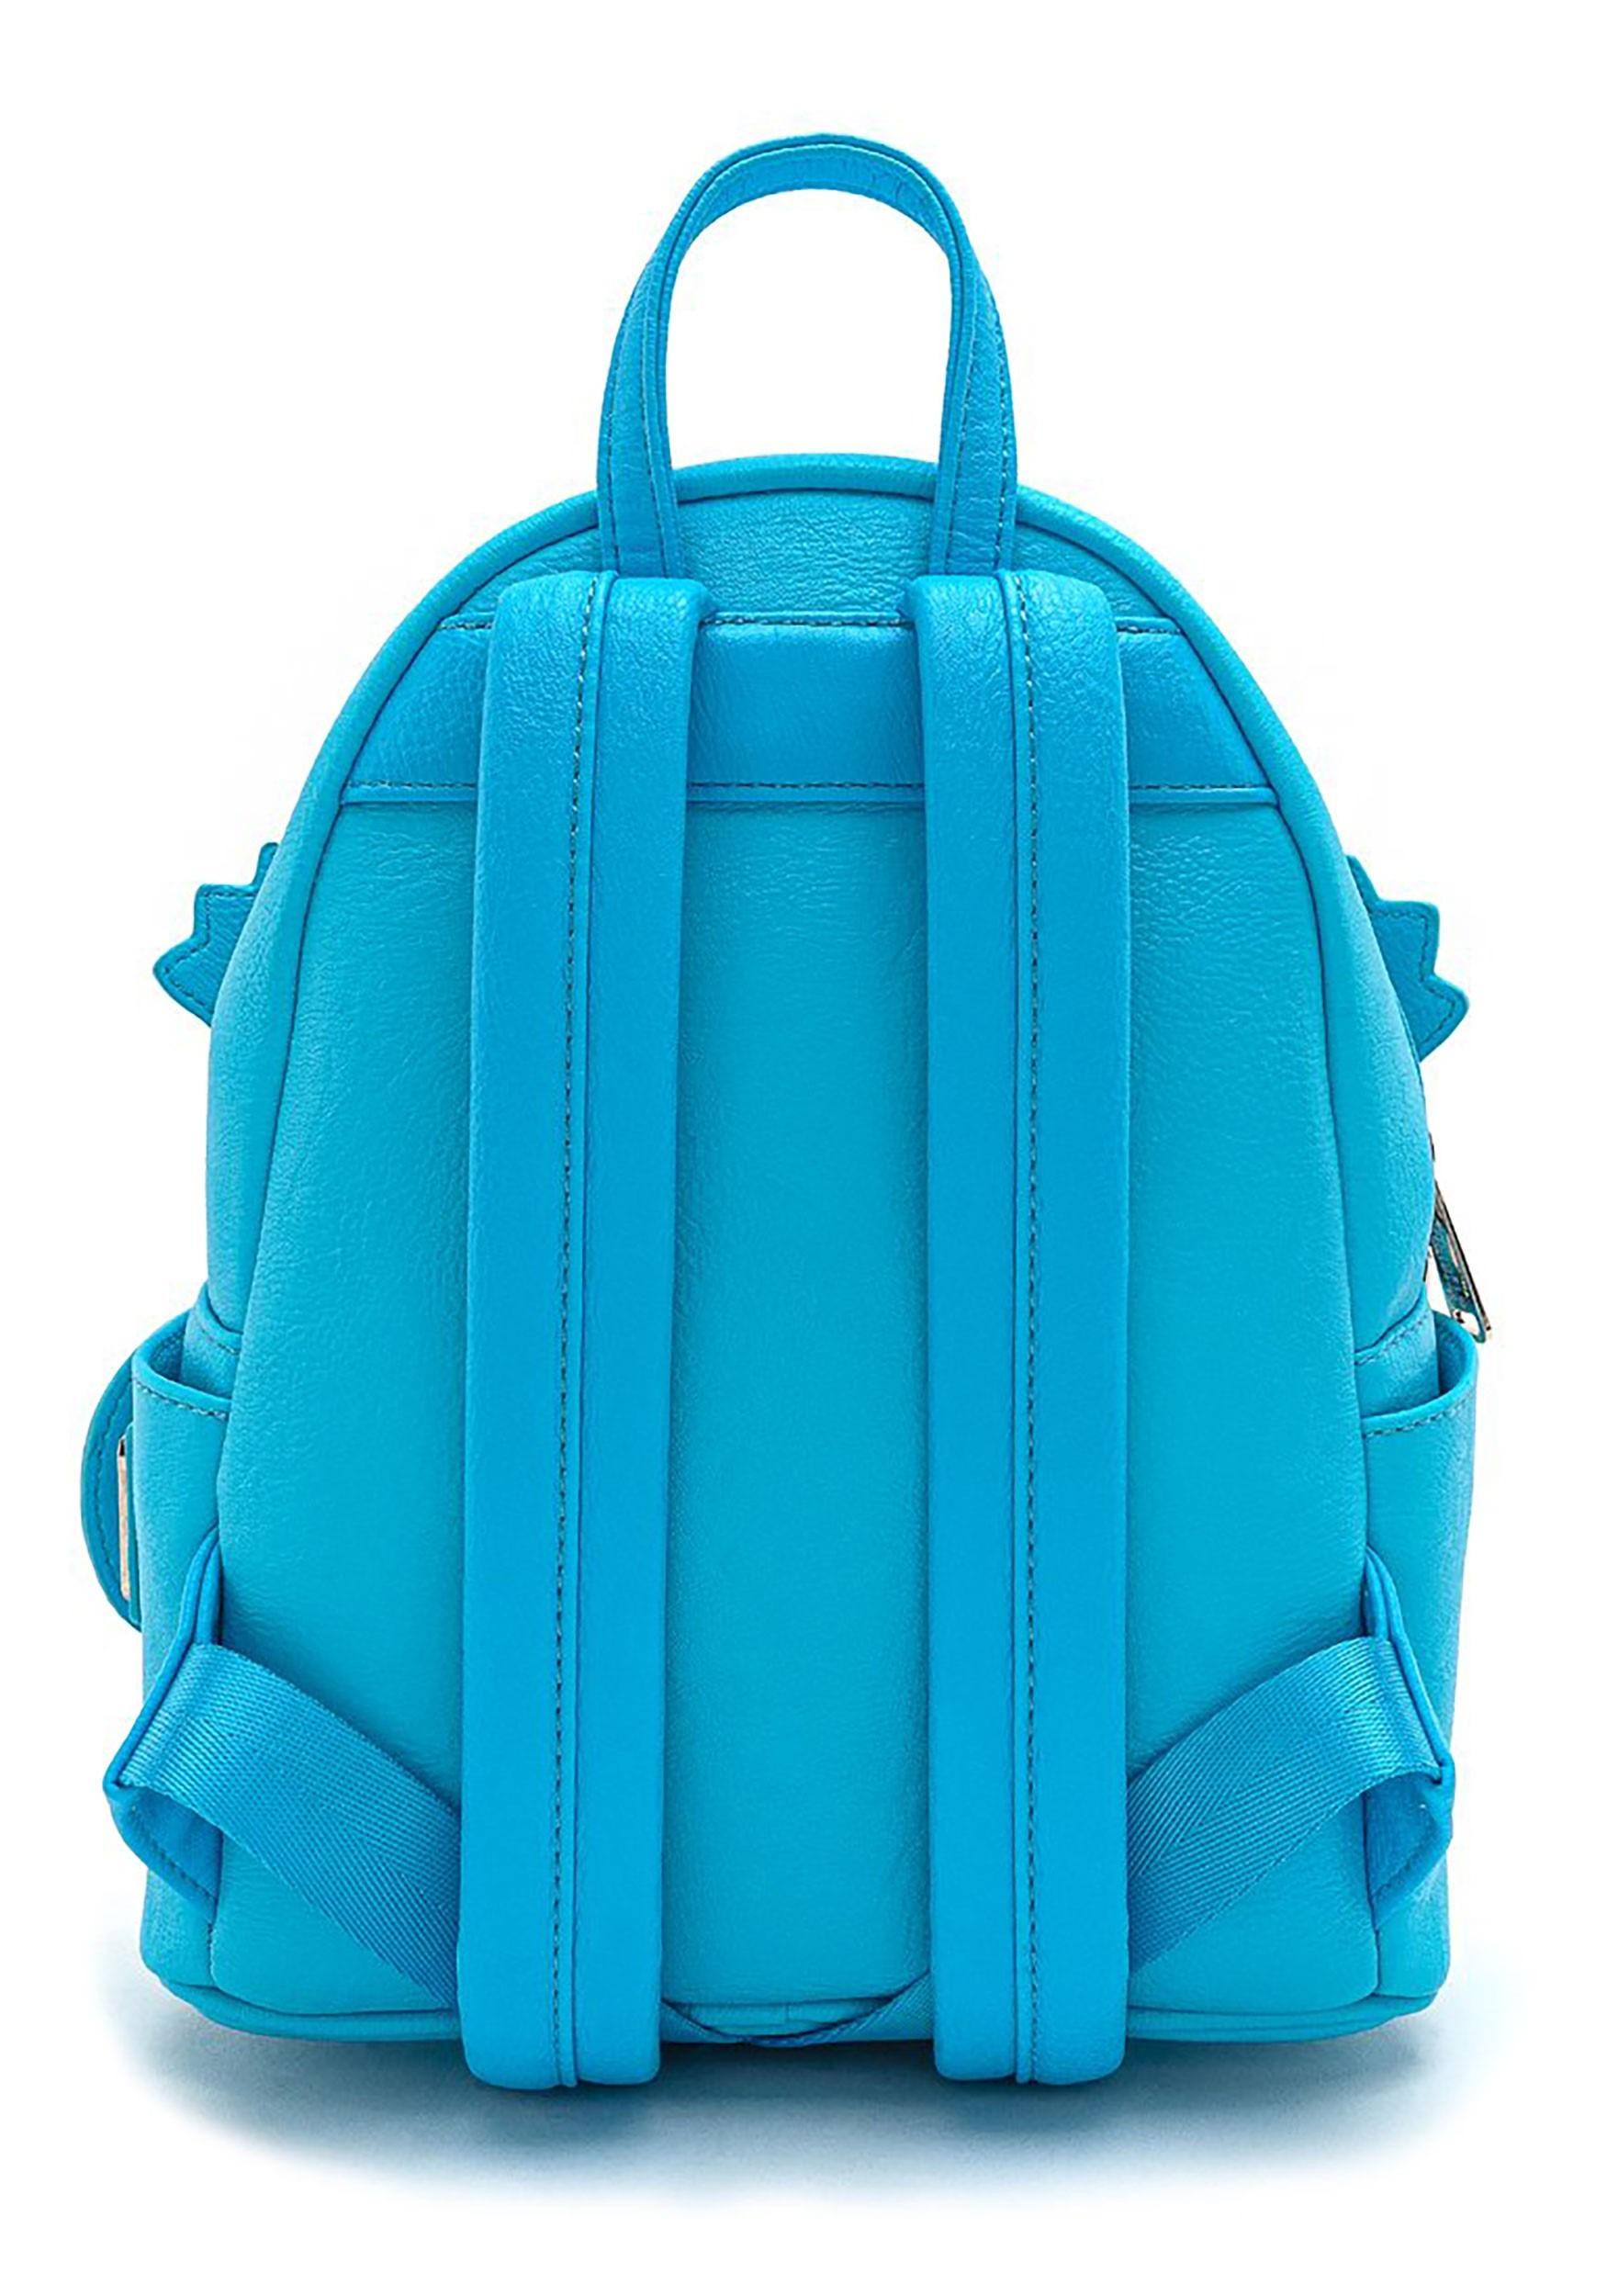 Squirtle Cosplay Loungefly Mini Backpack Pokemon Backpack